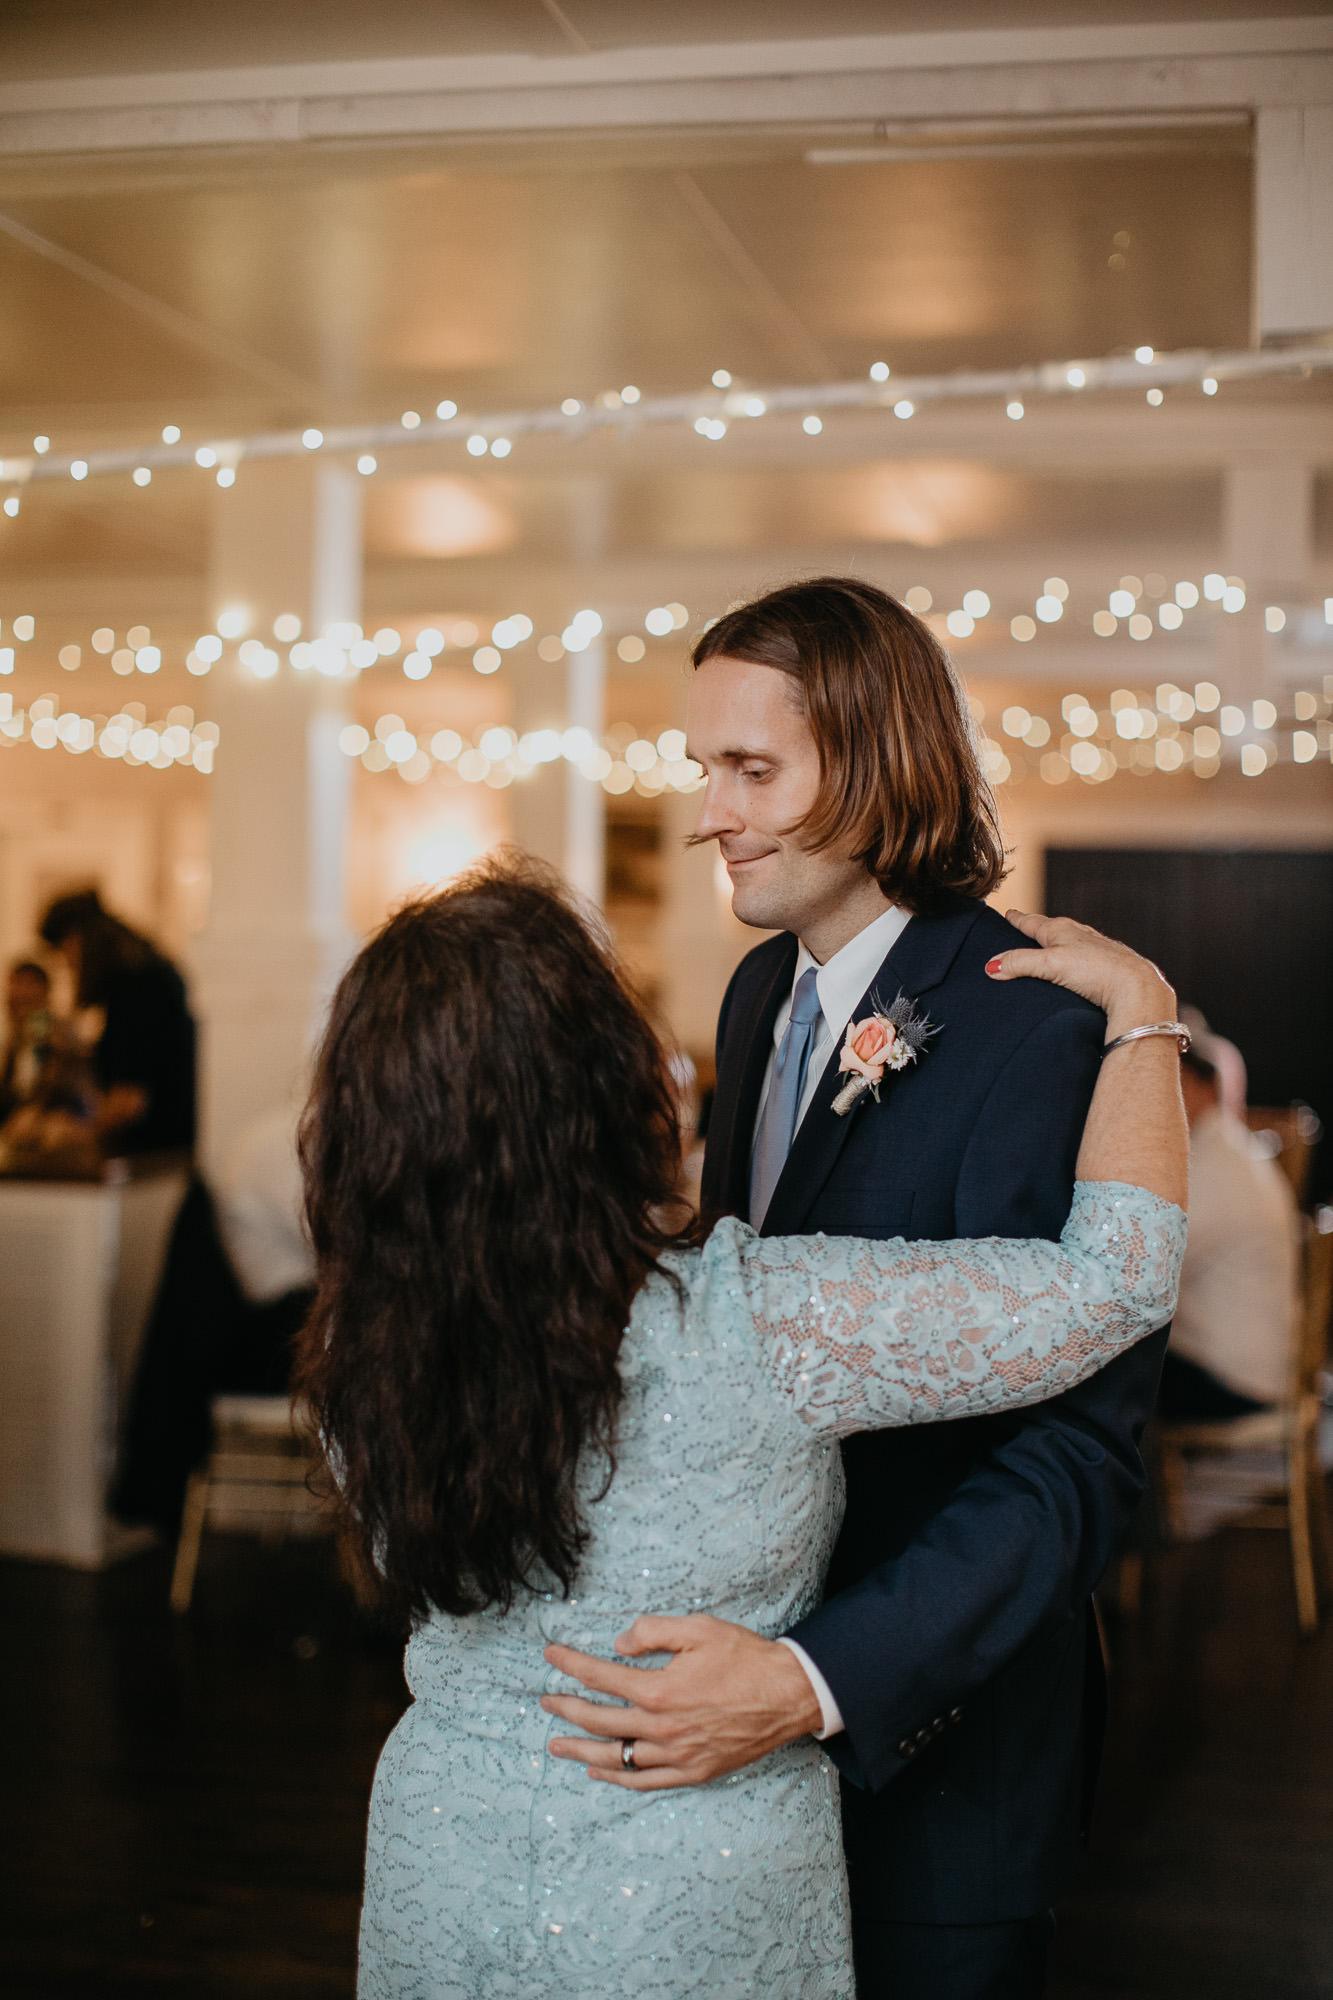 Doe Creek Farm - Weddings - Virginia - Best Wedding Photographer - Pat Cori Photography-66.jpg